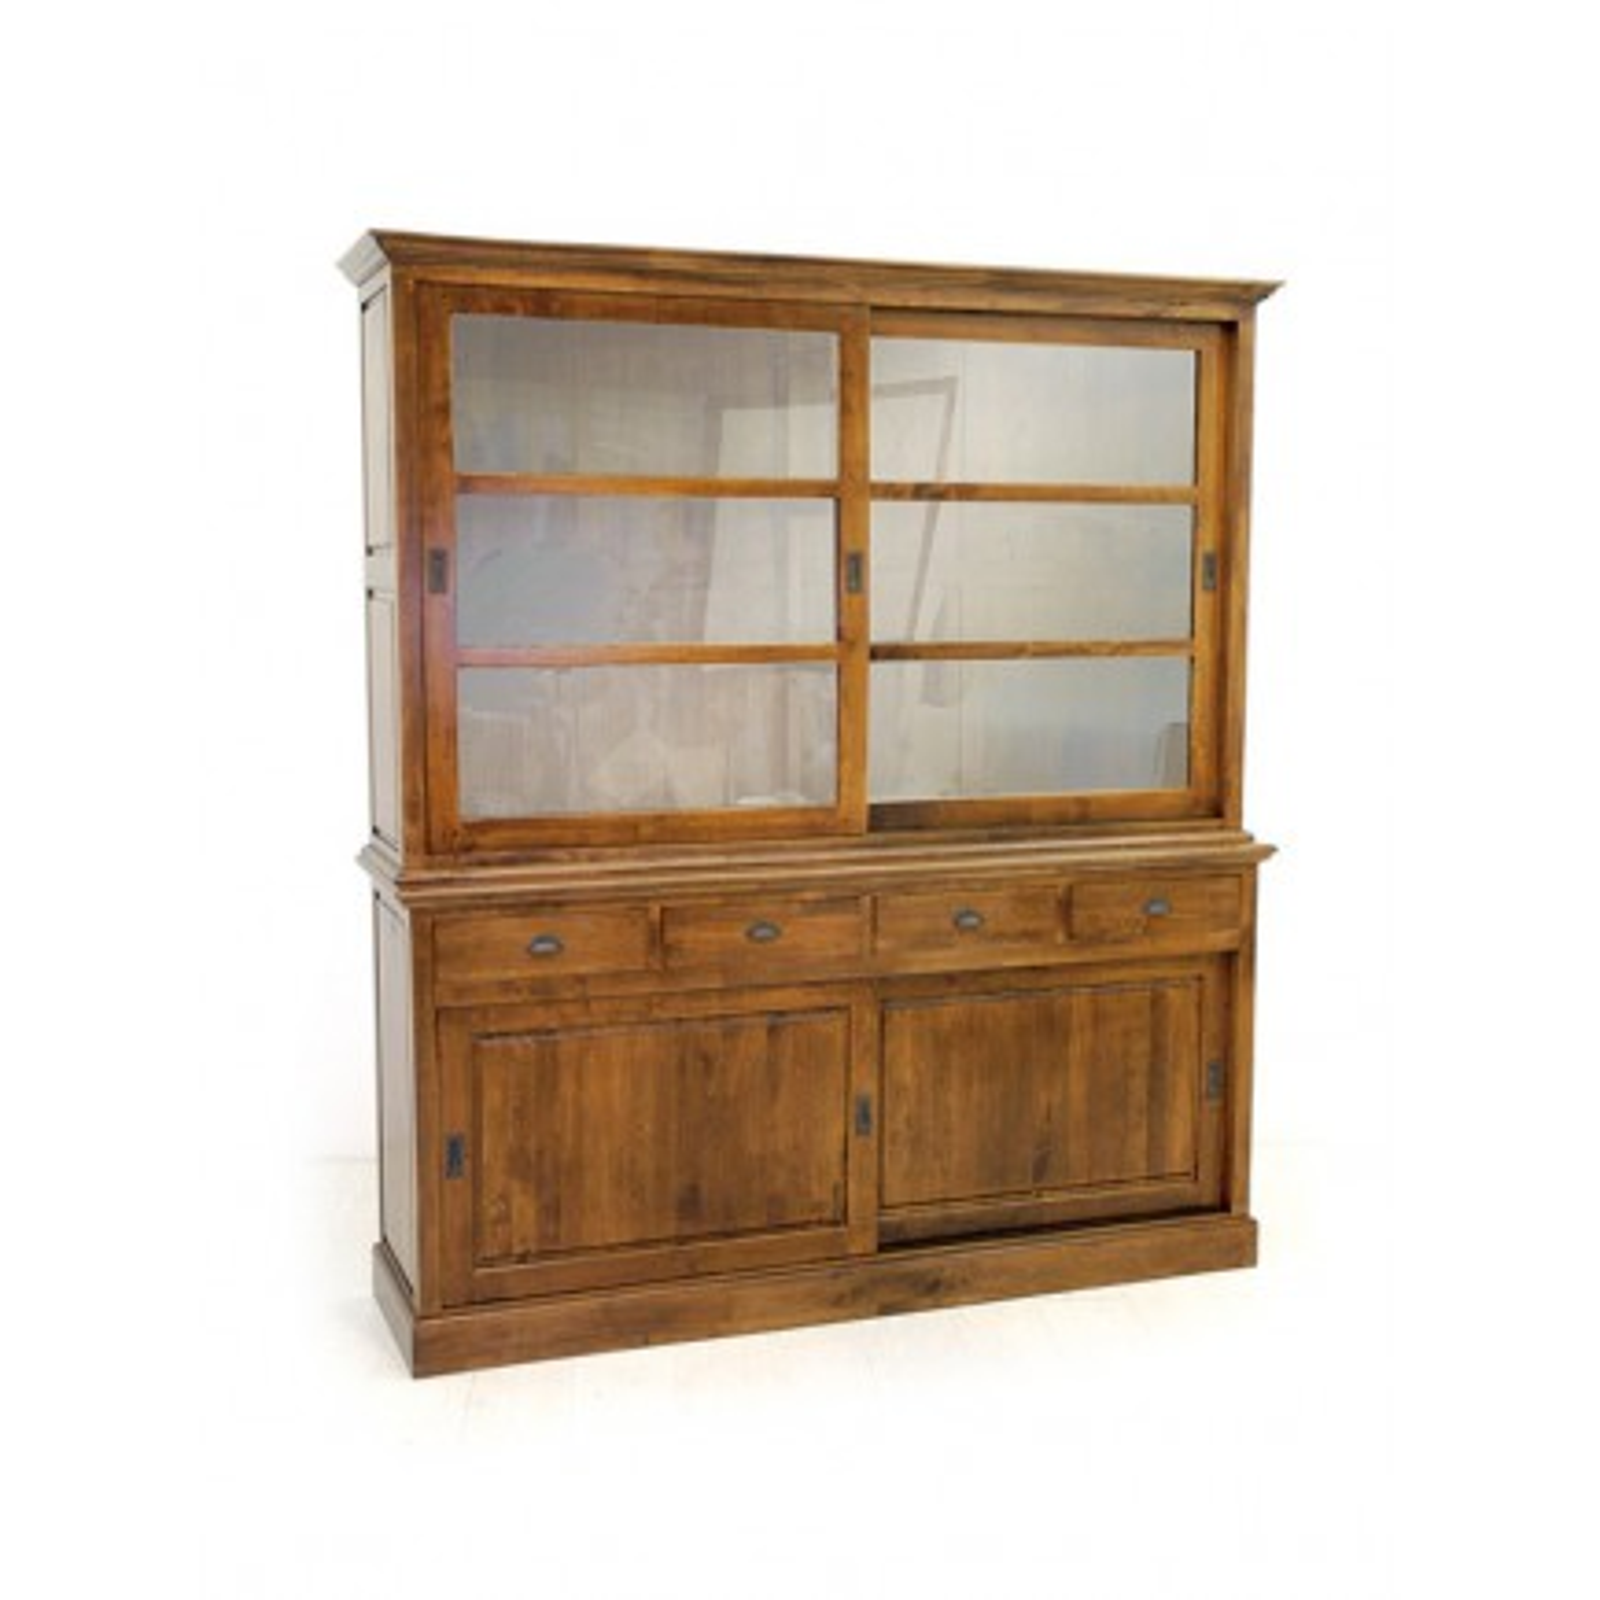 Buffet Vitré Tradition Hévéa - meuble style classique